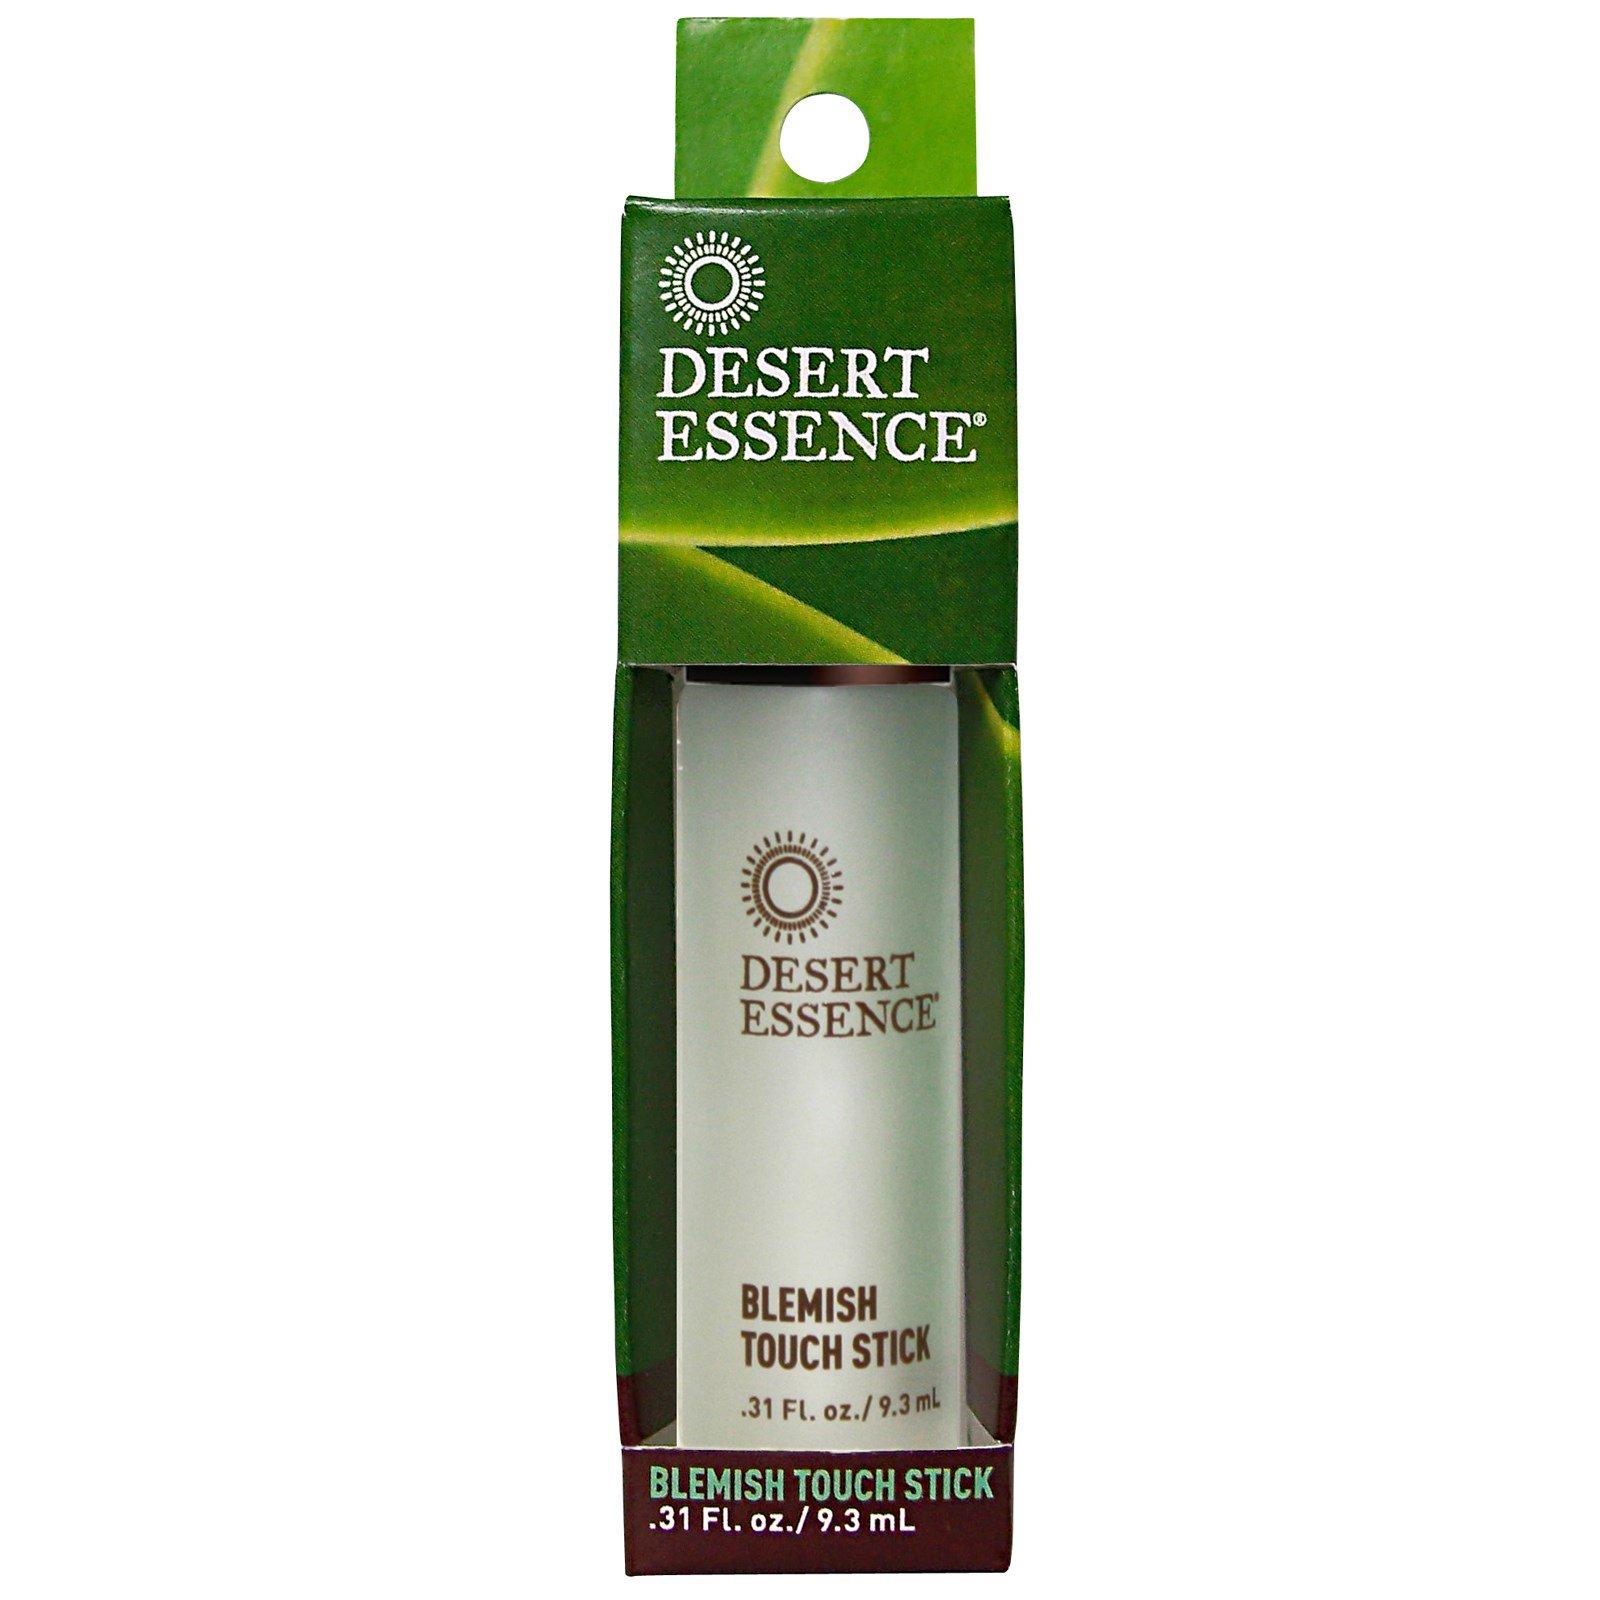 Desert Essence Blemish Touch Stick 0.33 Fl Oz / 10 Ml (Pack of 2) PHILIP MARTINS DEEP SKIN PRECIOUS MEN 30ML